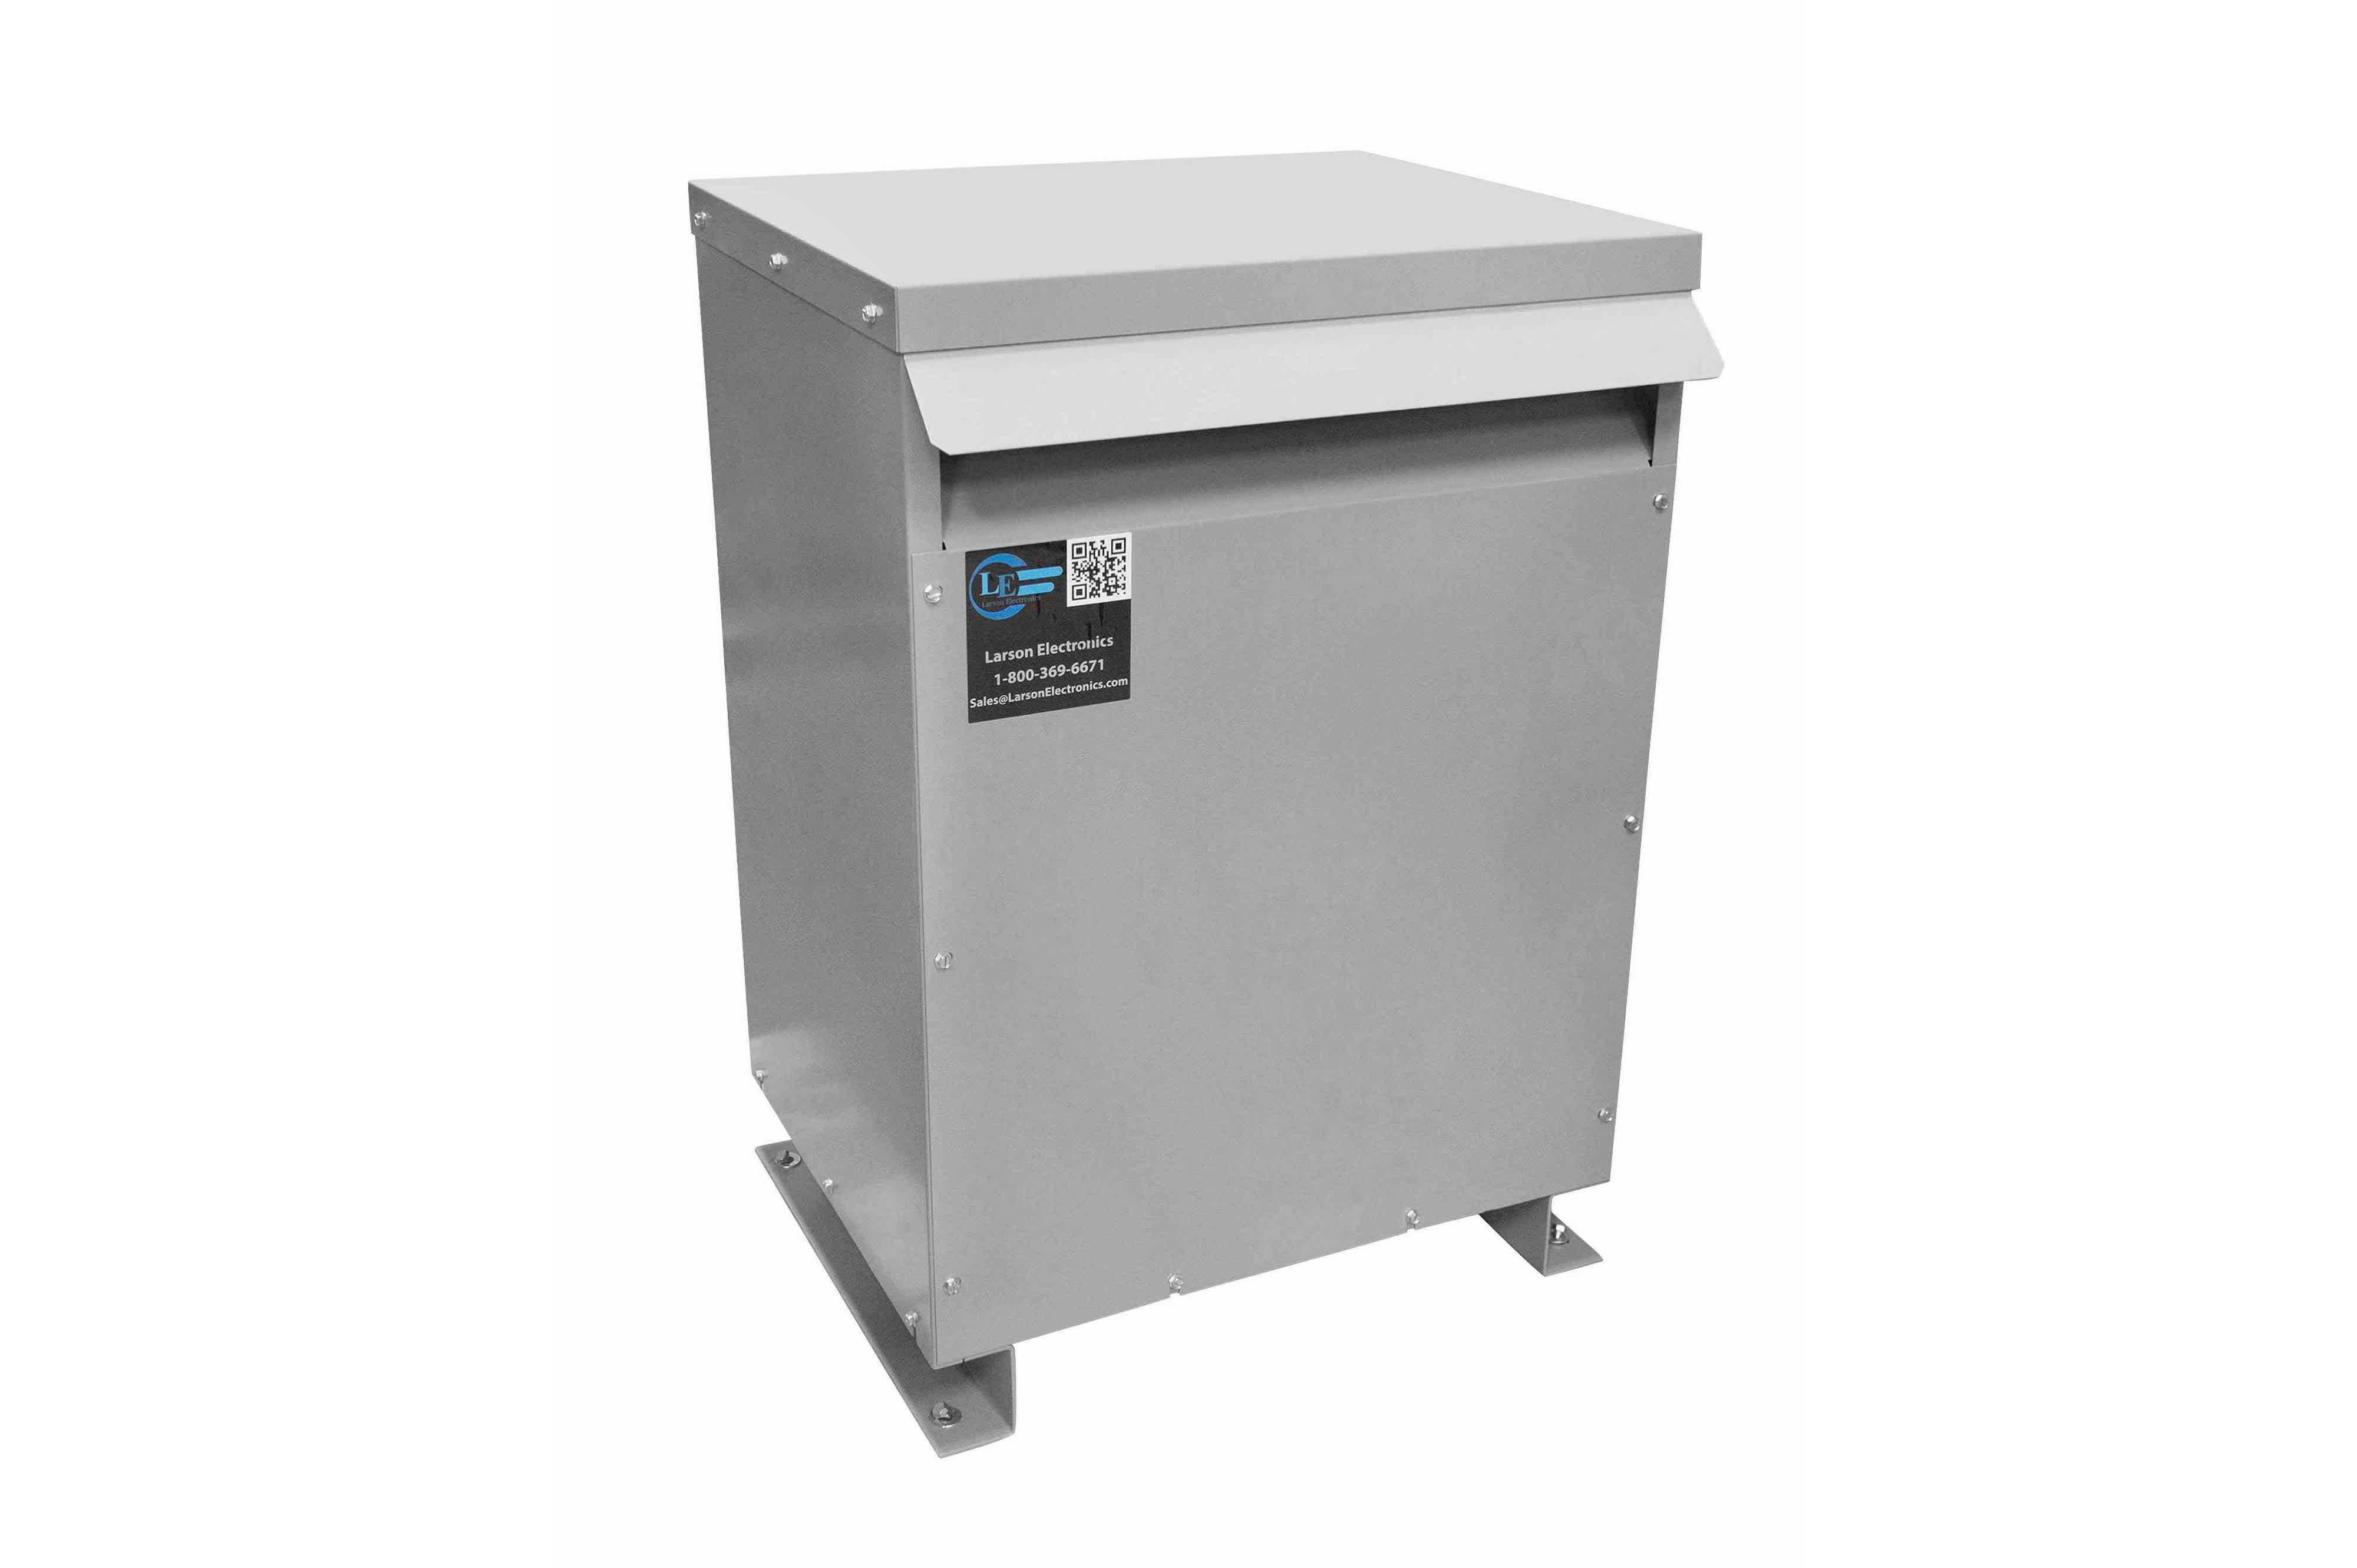 40 kVA 3PH Isolation Transformer, 575V Wye Primary, 480V Delta Secondary, N3R, Ventilated, 60 Hz